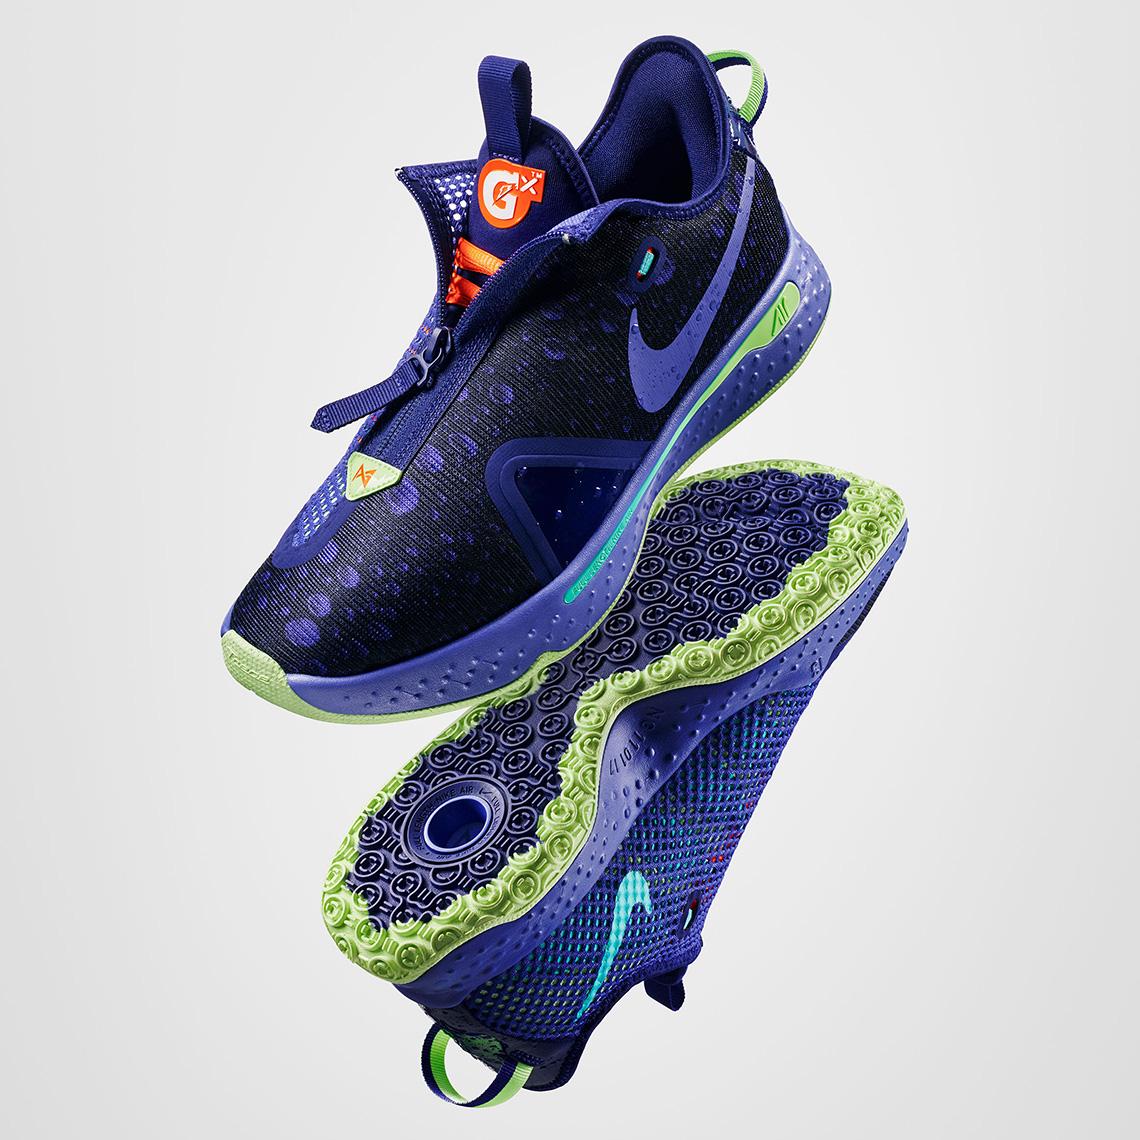 Gatorade Nike PG 4 - CD5078-500 Release